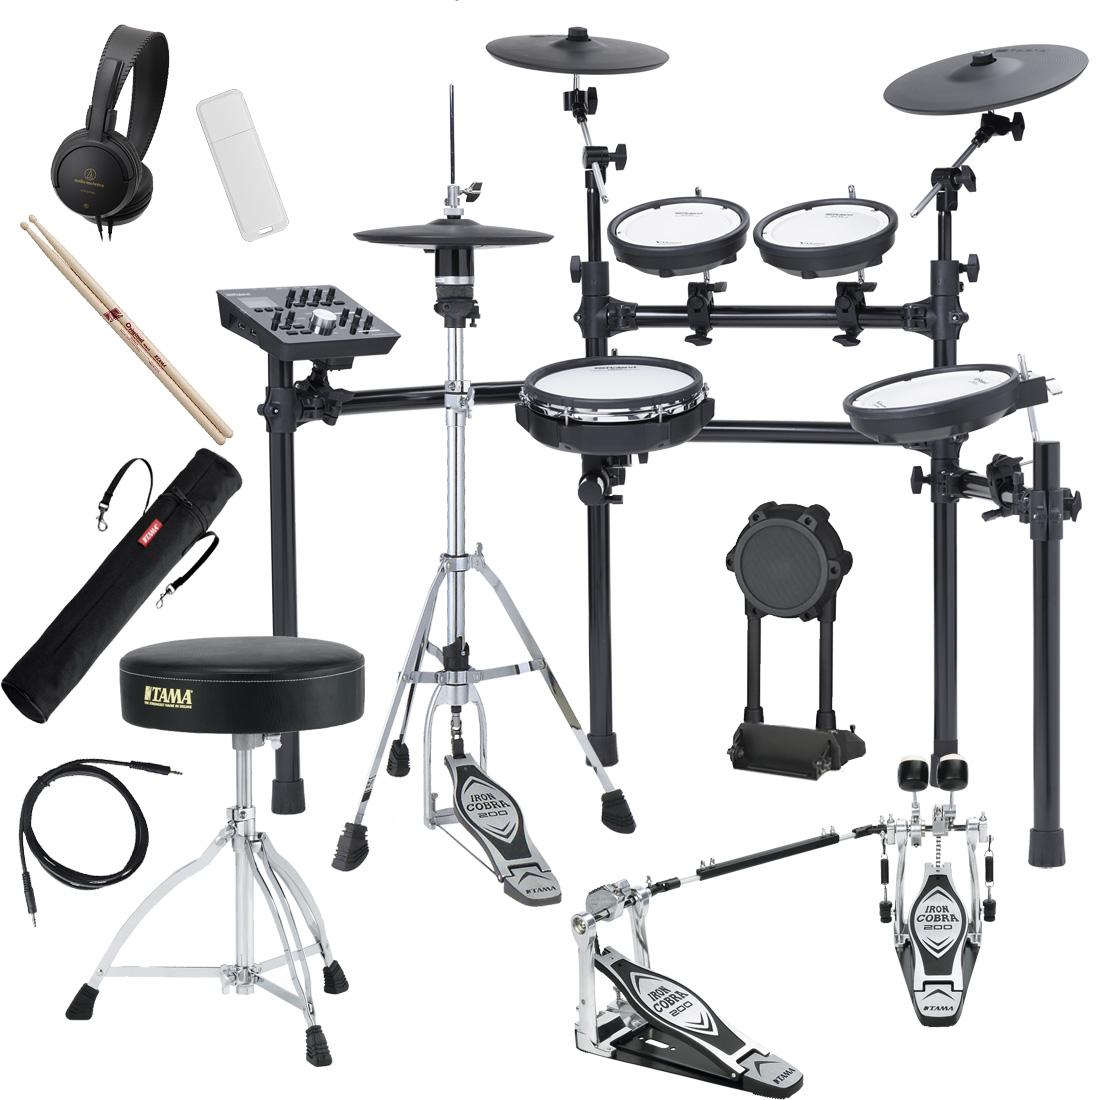 【Rolandキャッシュバック10000円対象】Roland Drum System TD-25K-S TAMAツインペダルスターターパック 電子ドラムセット【YRK】